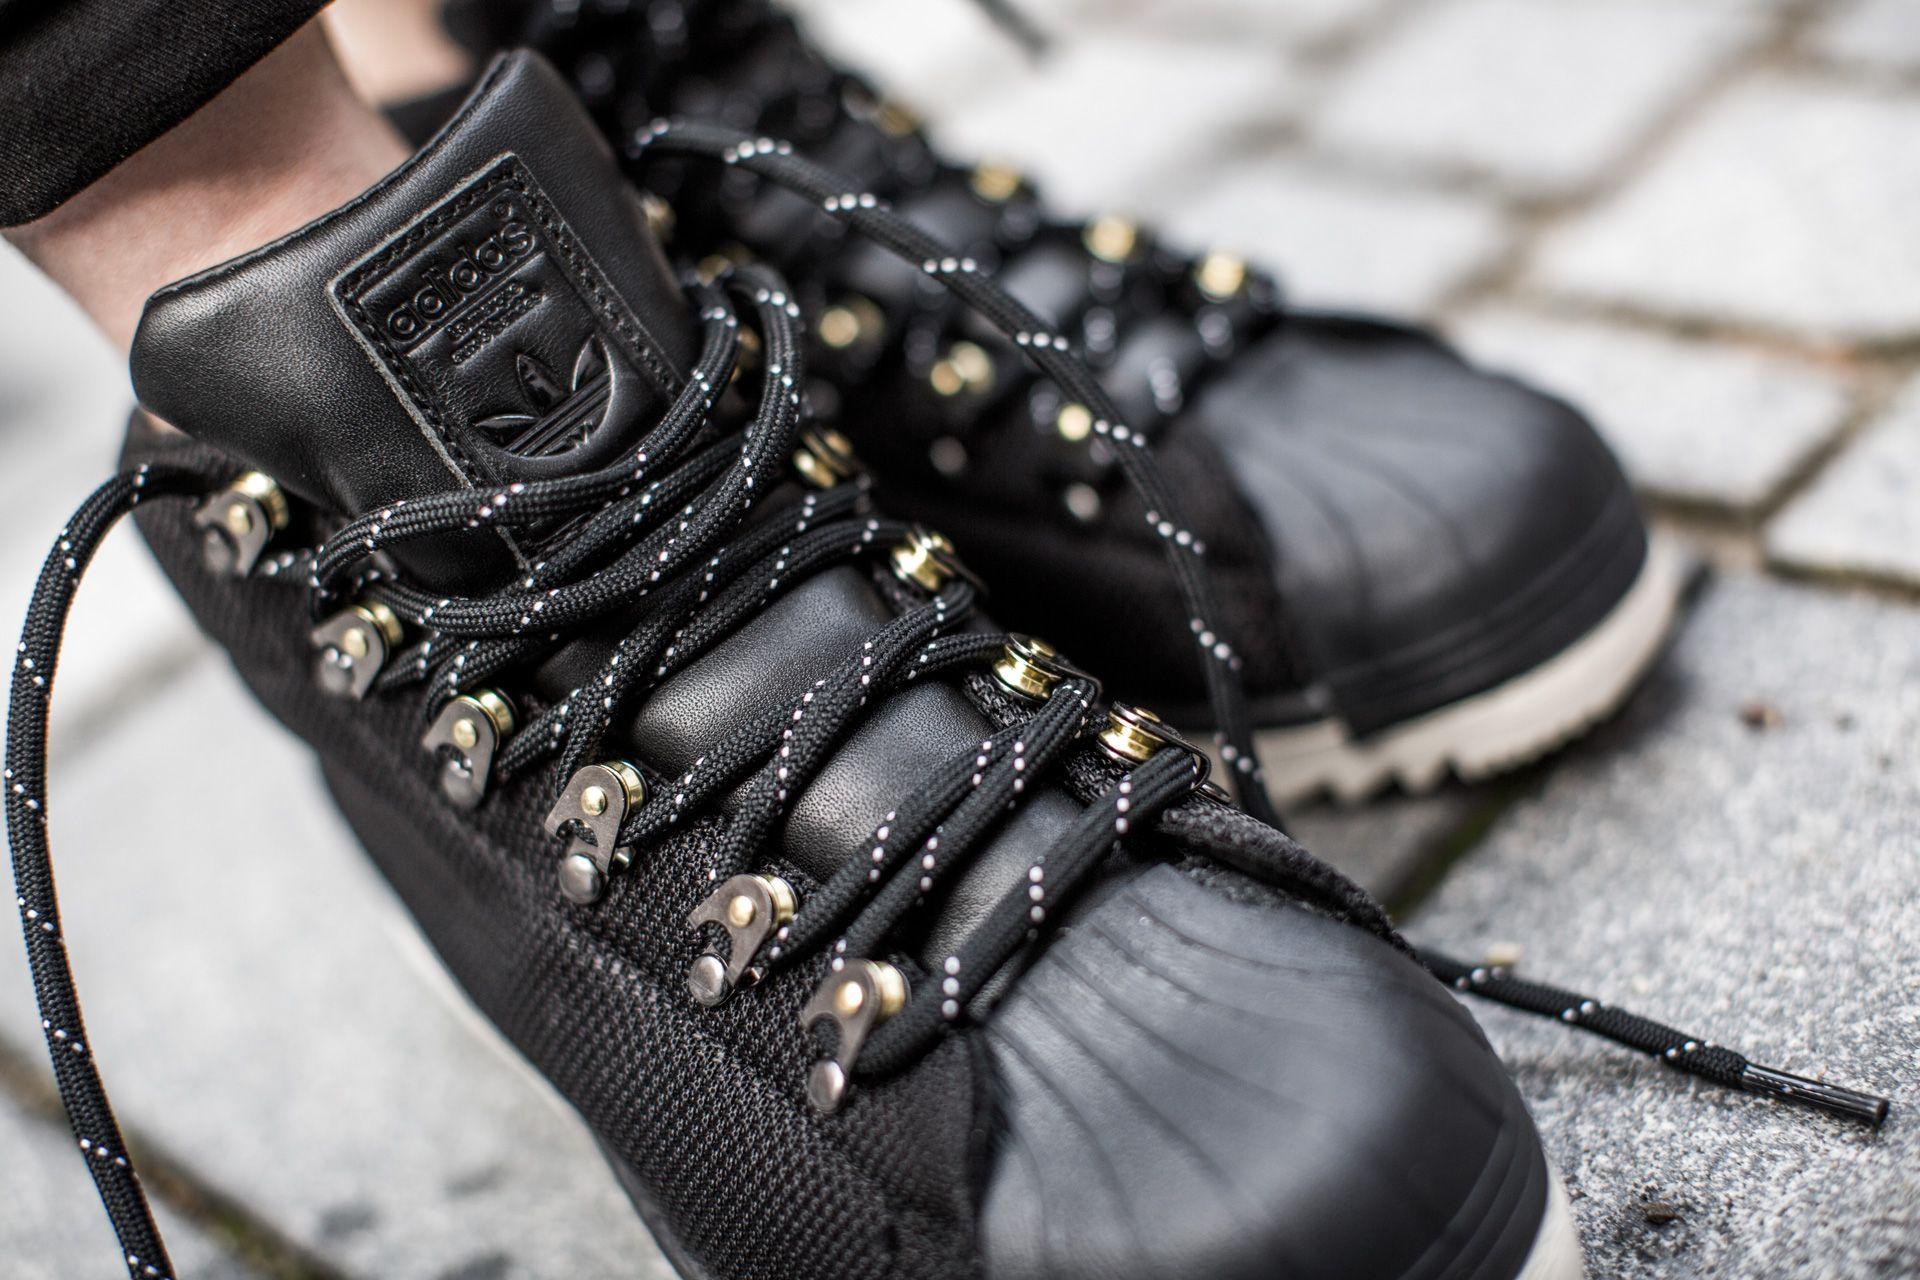 33f09ed8a3c2 ADIDAS PROMODEL BOOT GORETEX CBLACK CBLACK CWHITE available at  www.tint-footwear.com adidas-promodel-boot-goretex-s81625 Adidas promodel  boot goretex black ...